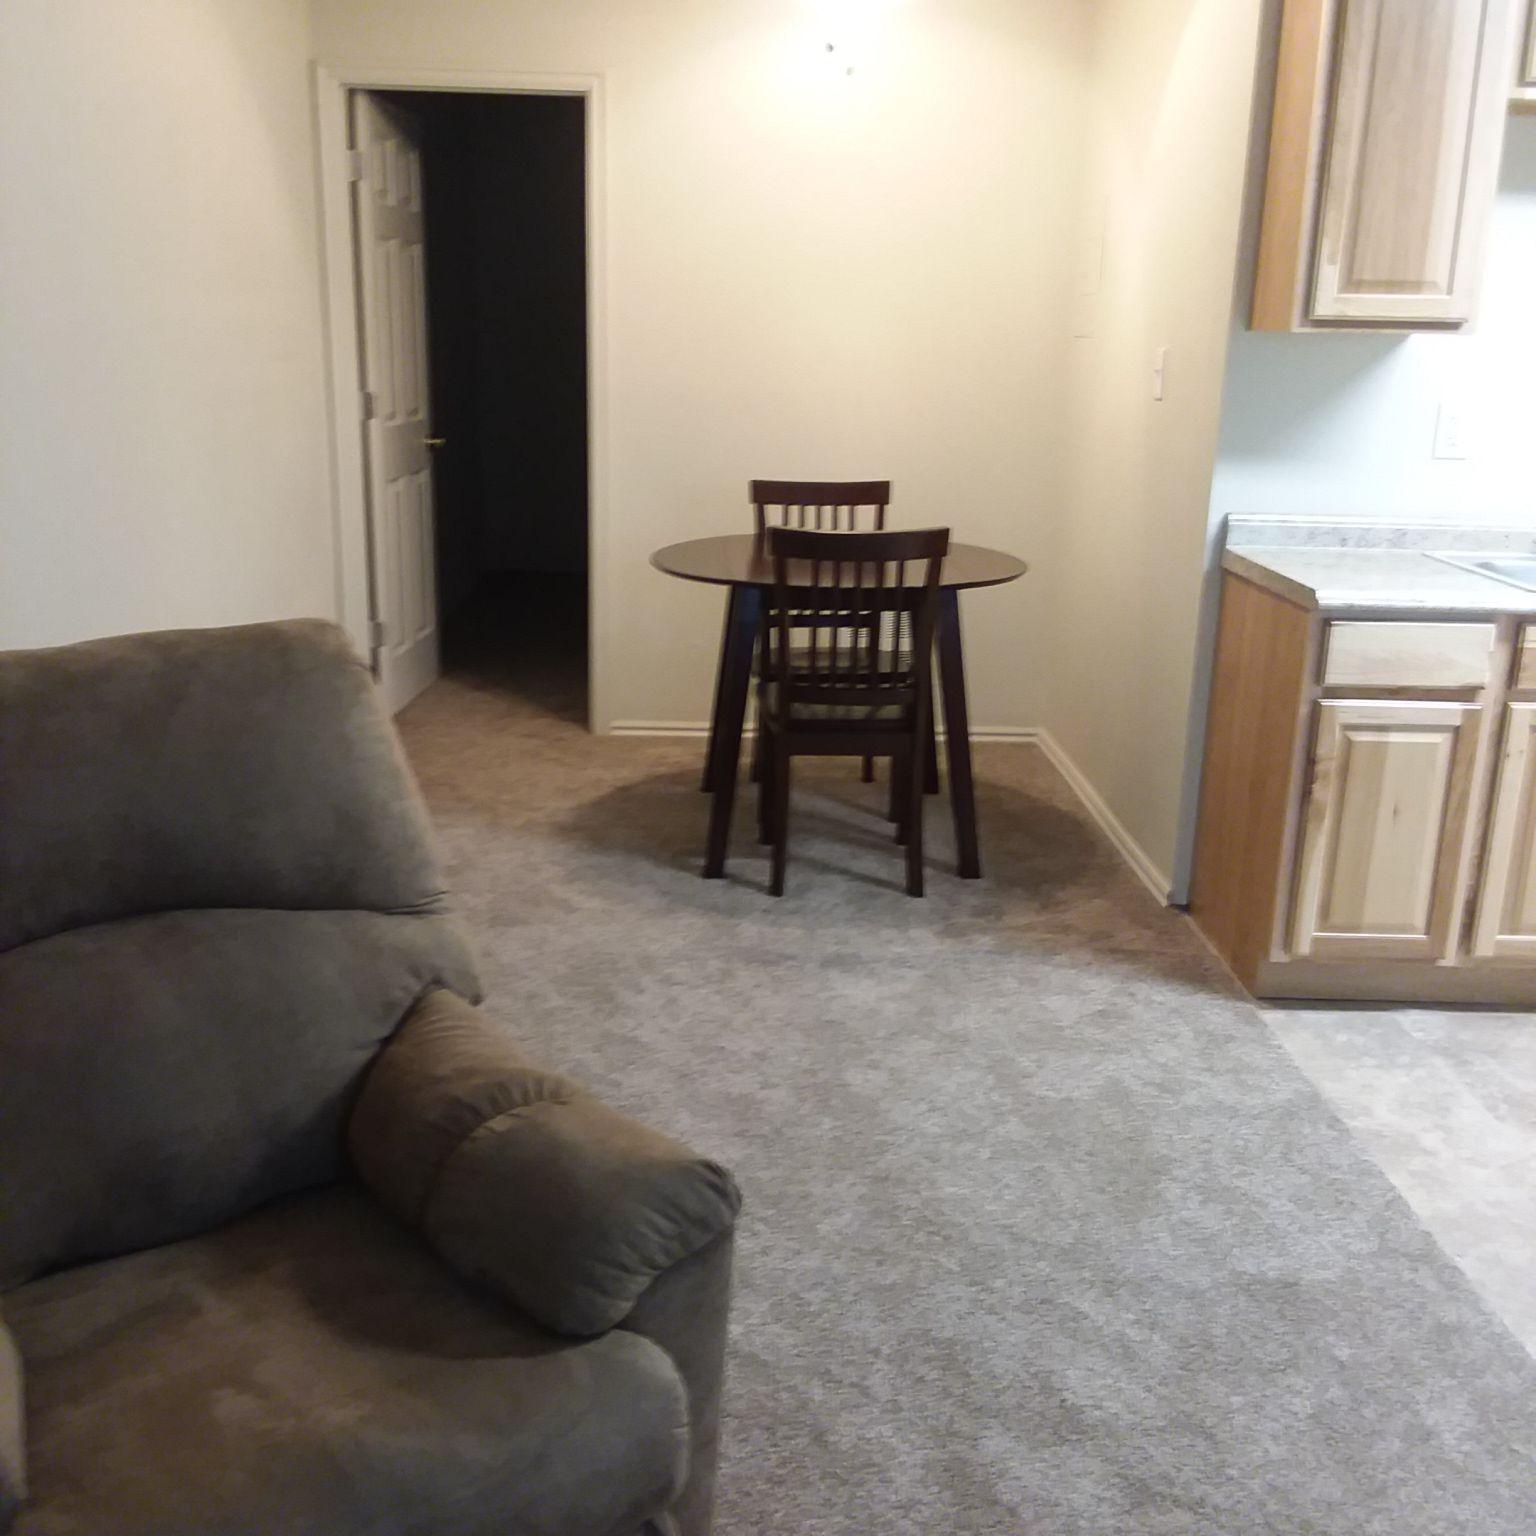 Apartment Rental image 1